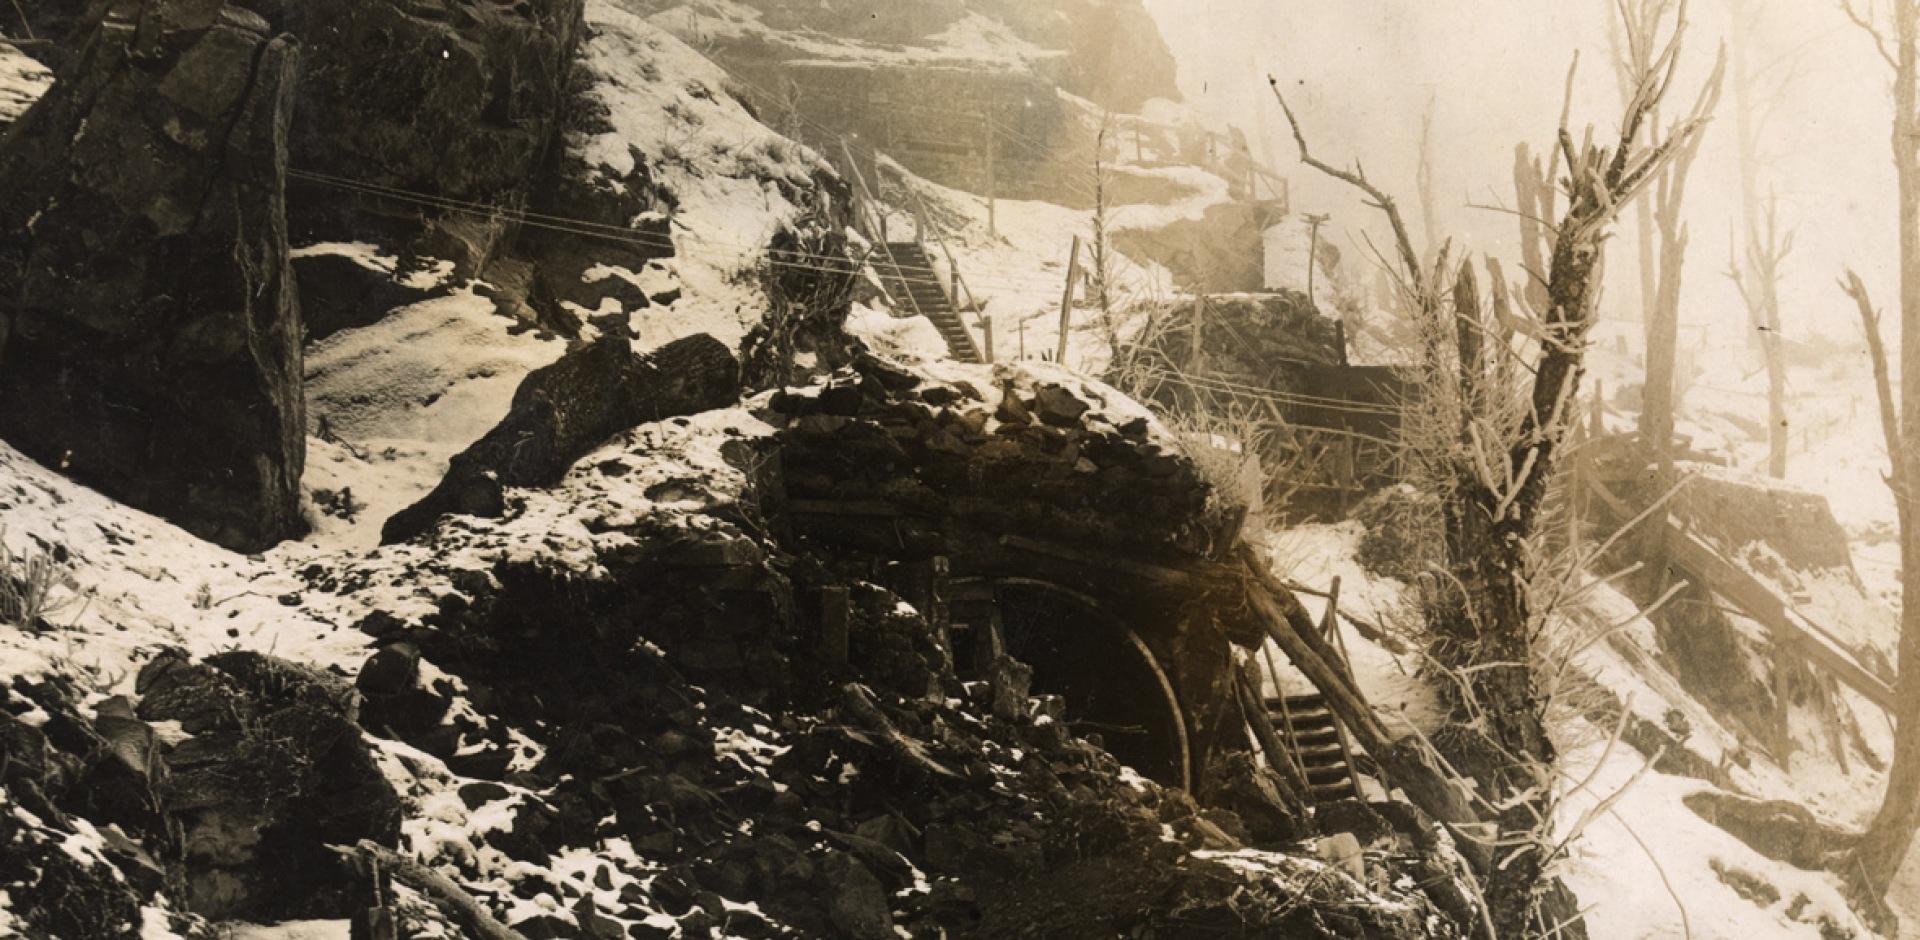 Le champ de bataille du Hartmannswillerkopf